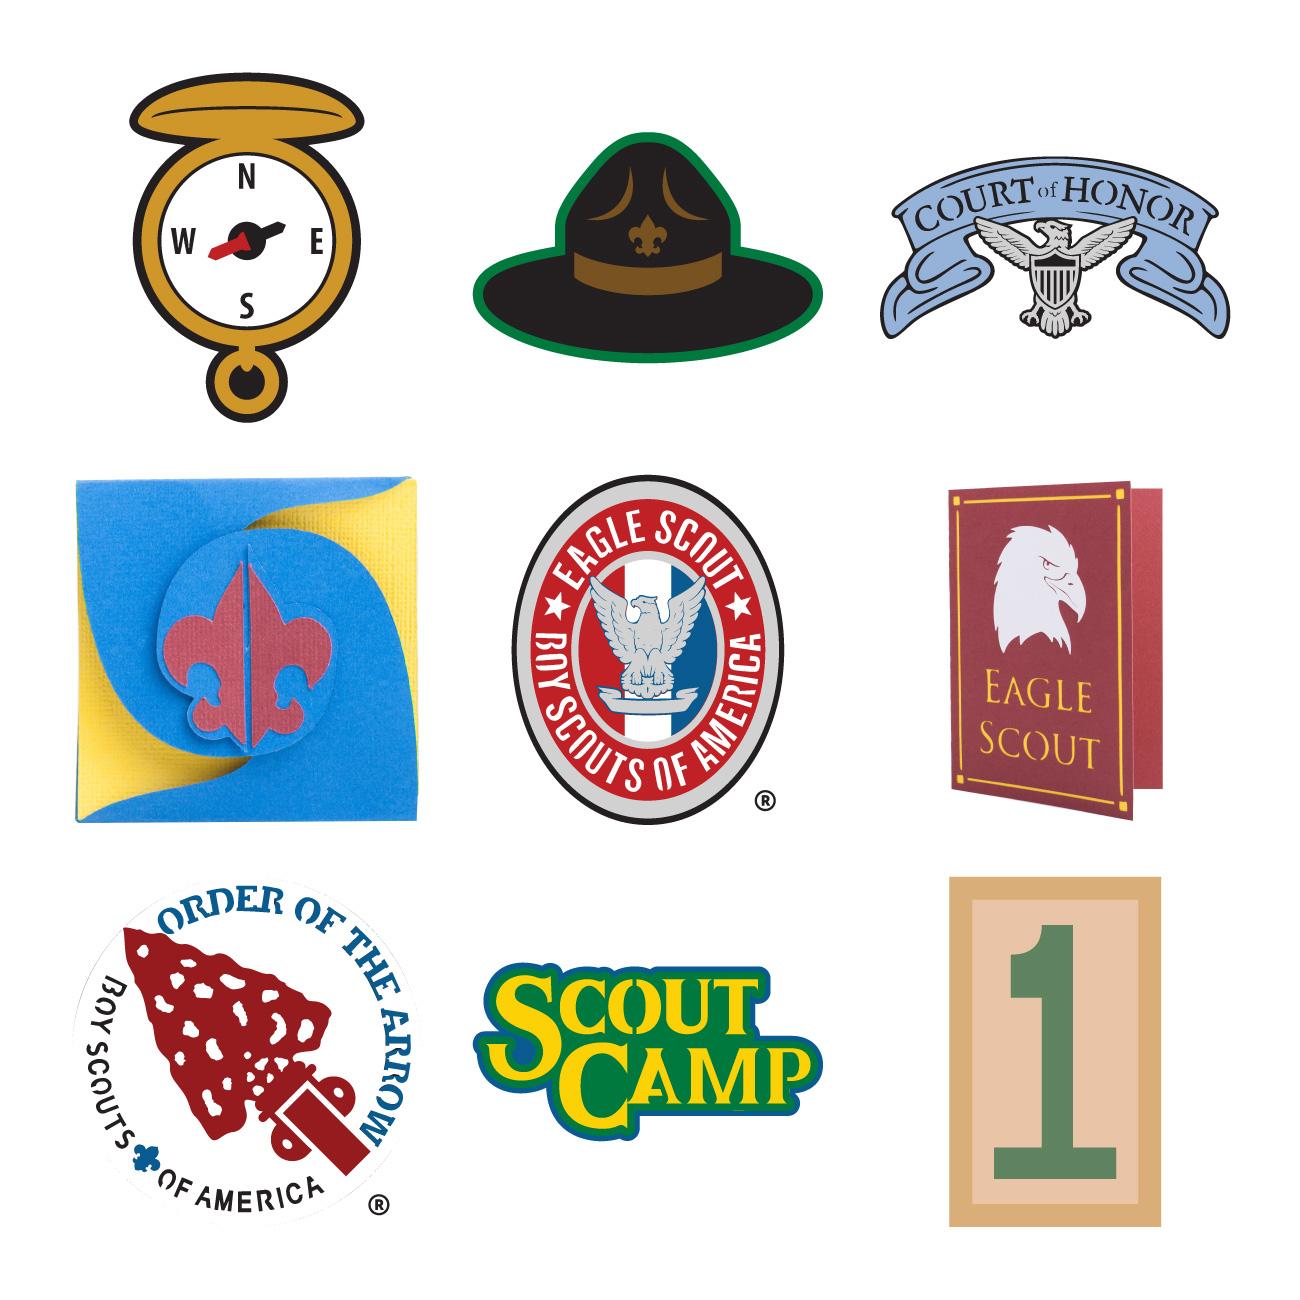 1300x1300 Be For Boy Scoutsamp 153